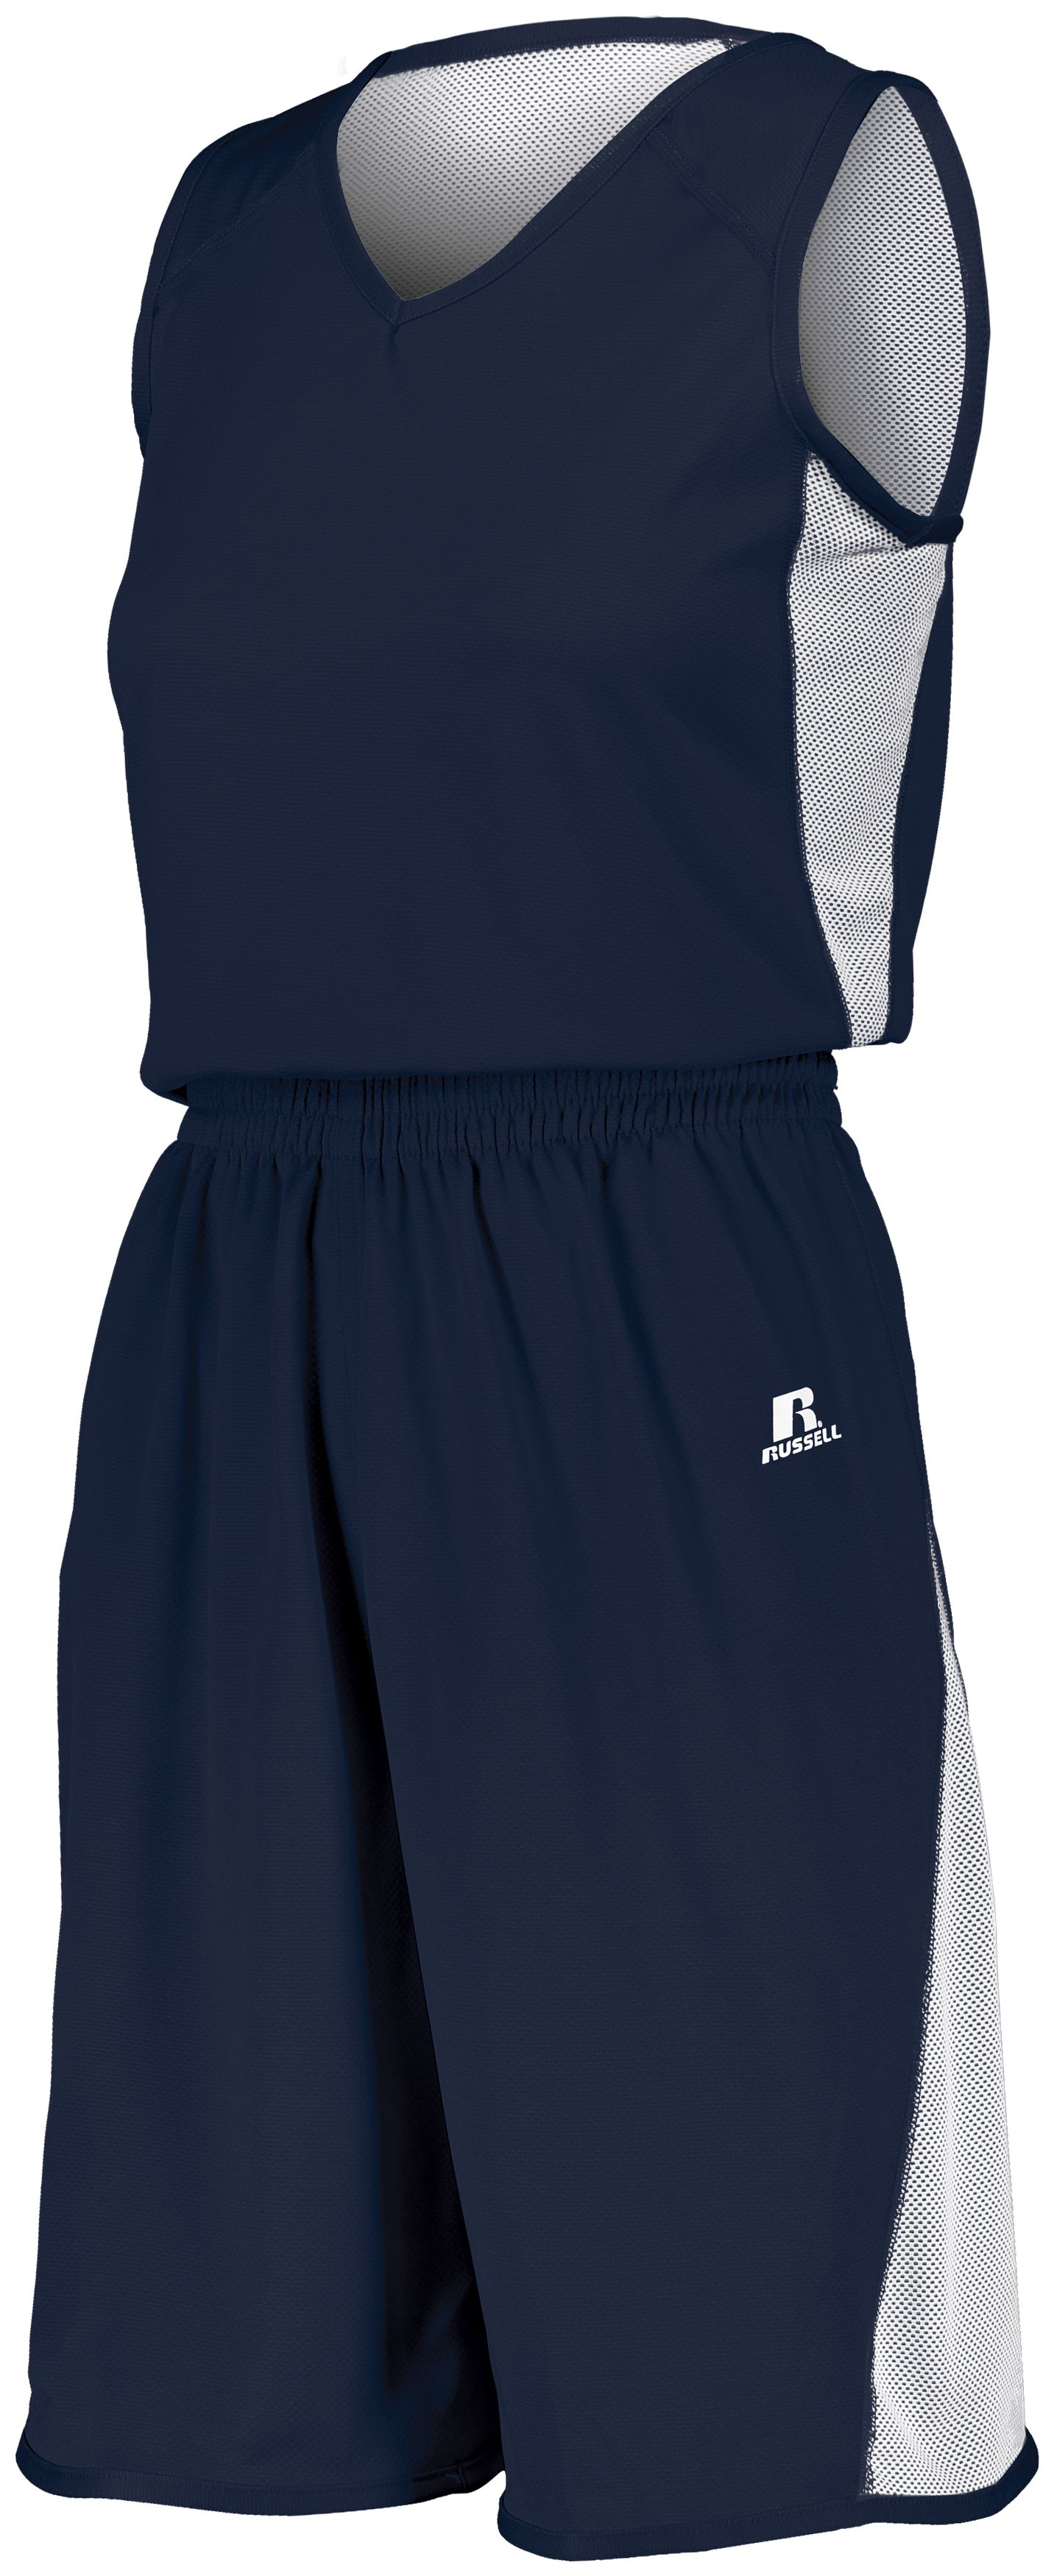 Ladies Undivided Single Ply Reversible Shorts - NAVY/WHITE